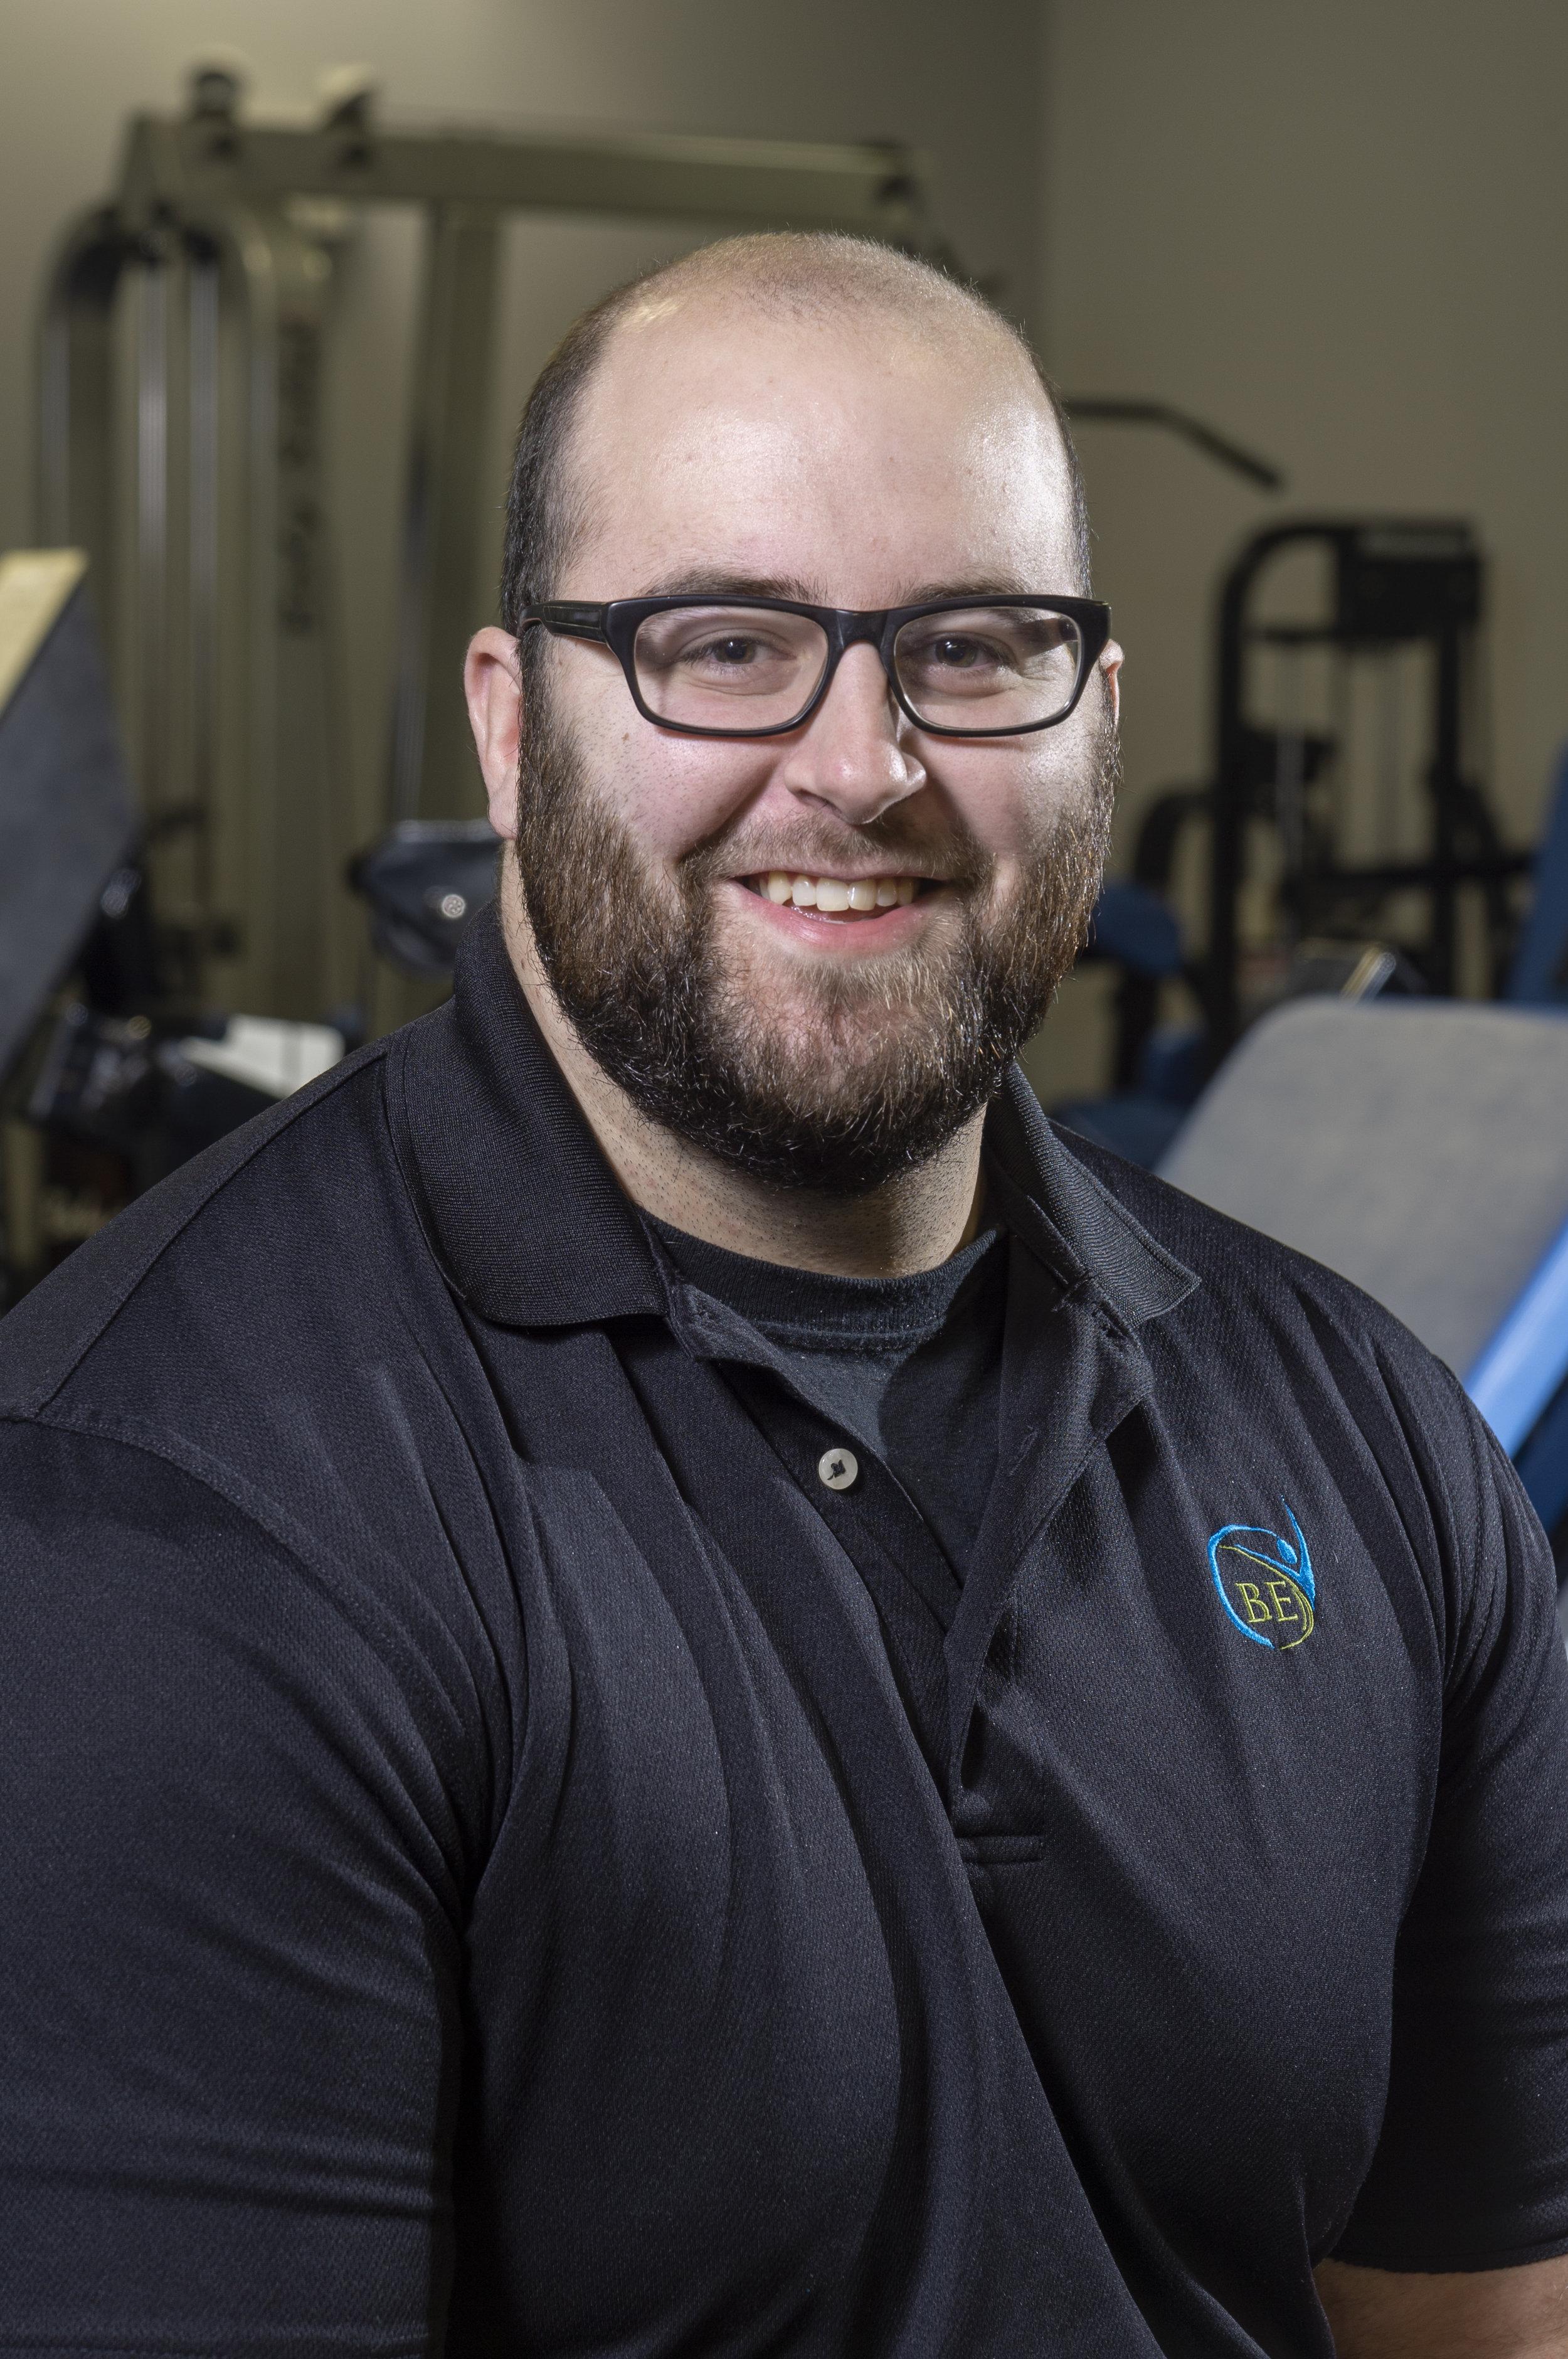 Sean Willitts, Body Elite Personal Trainer